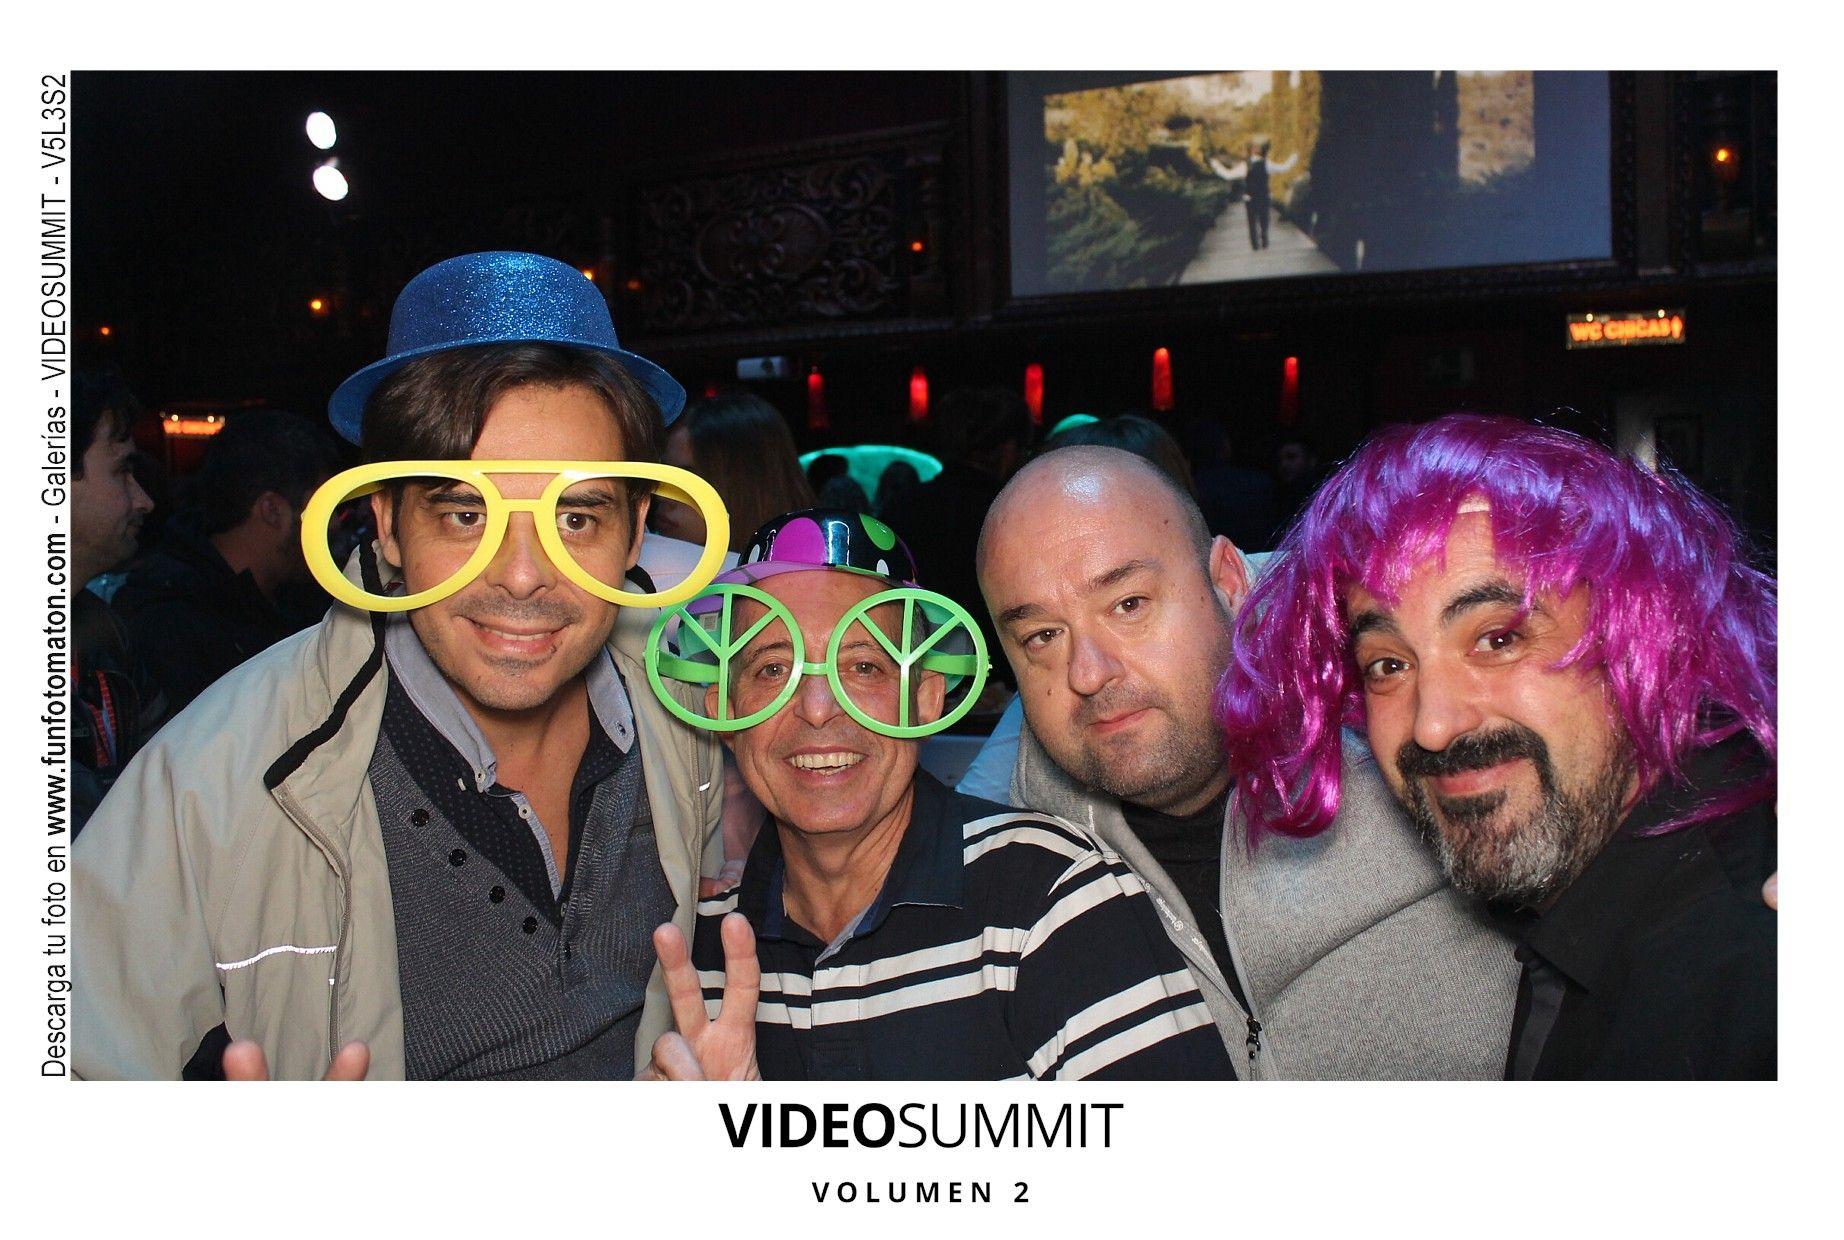 videosummit-vol2-club-party-070